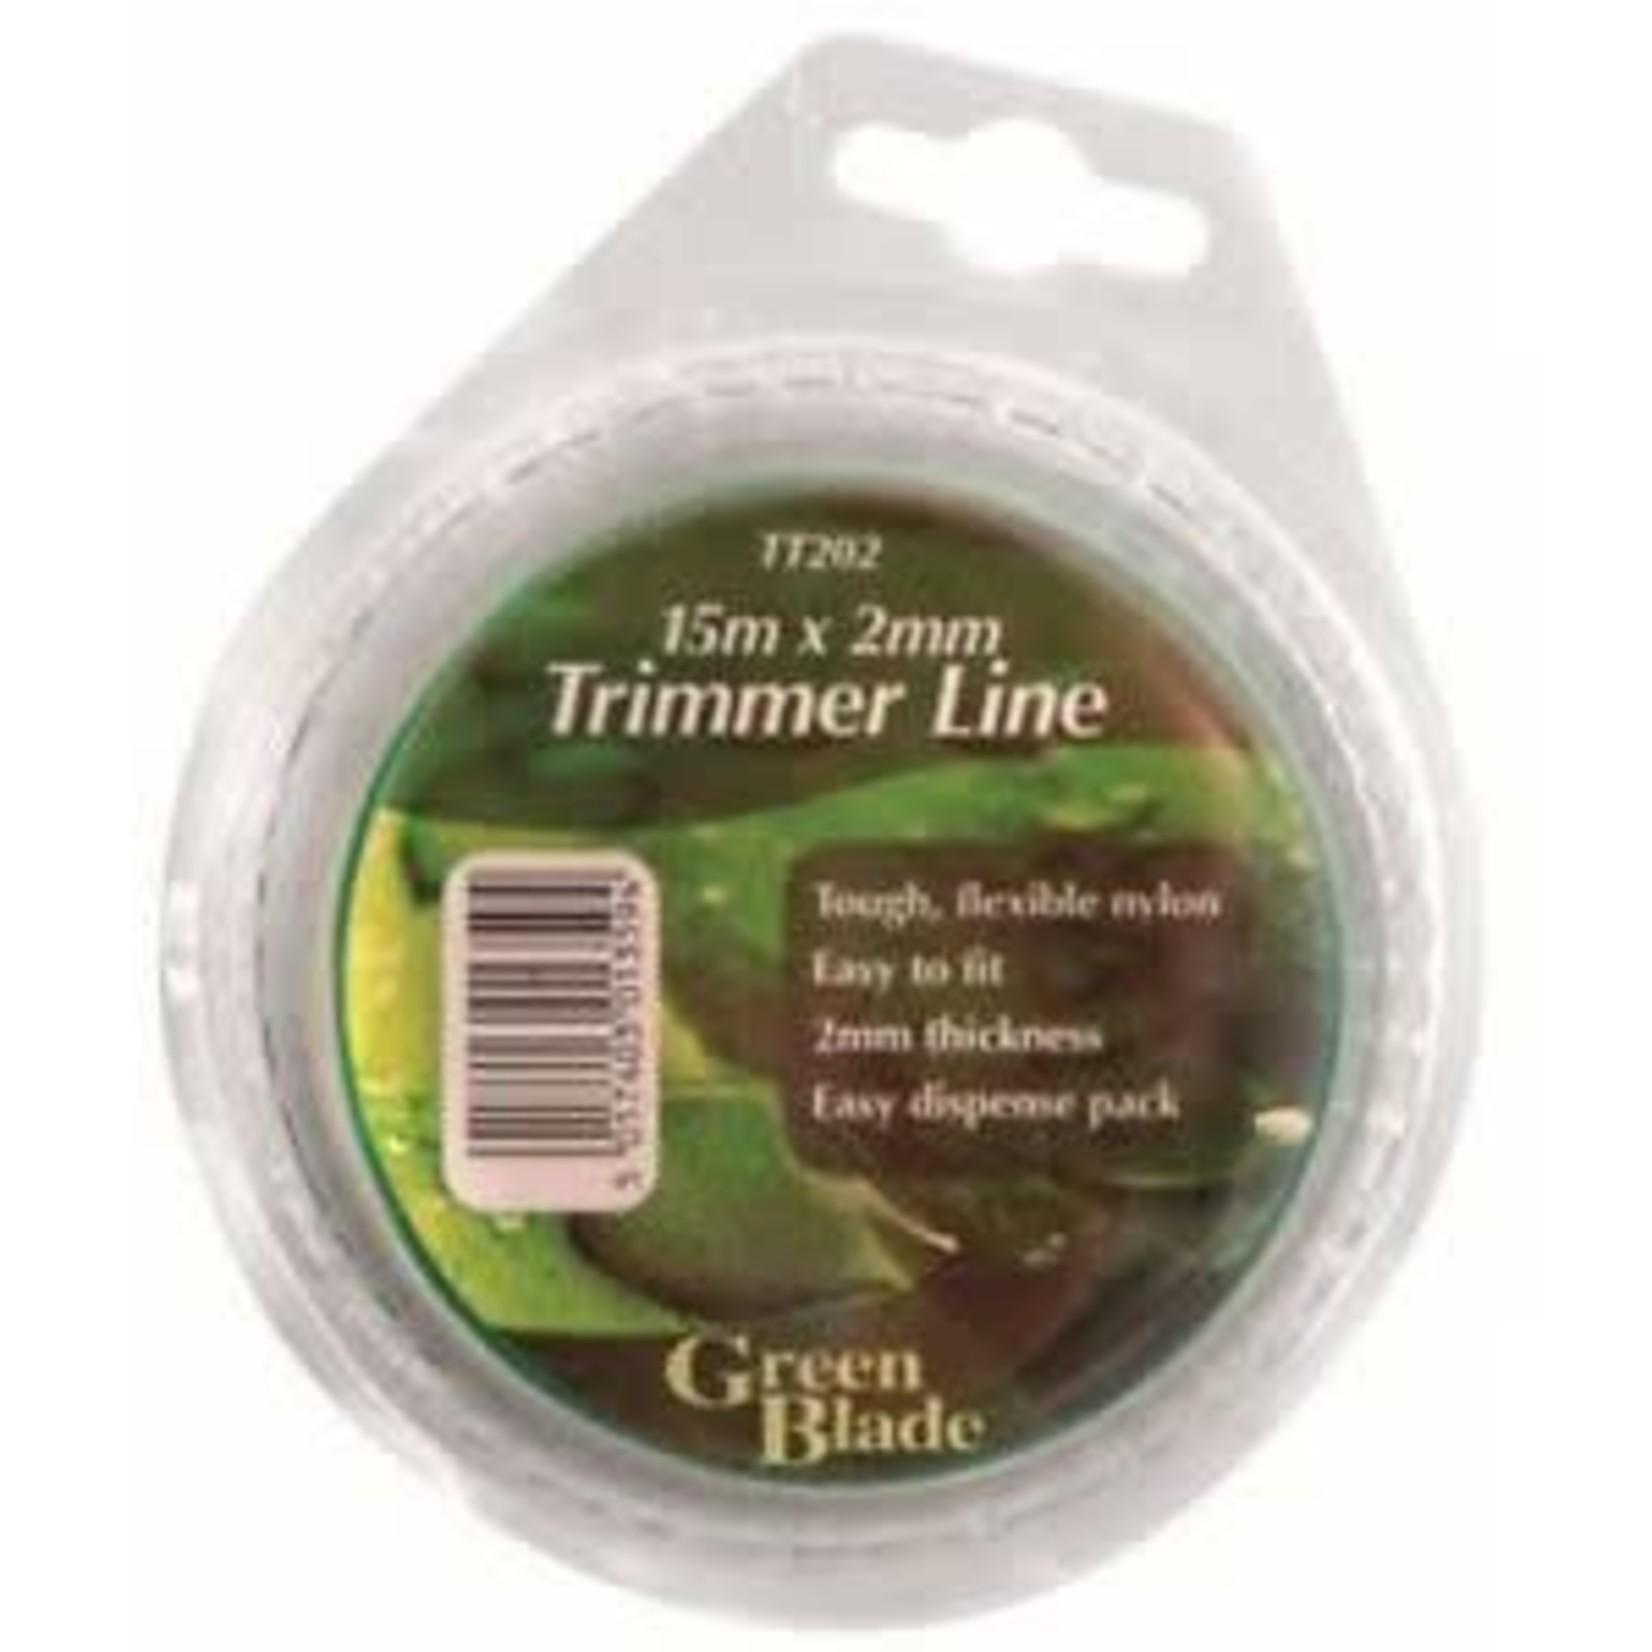 GREEN BLADE 15M X 2MM TRIMMER LINE GREEN